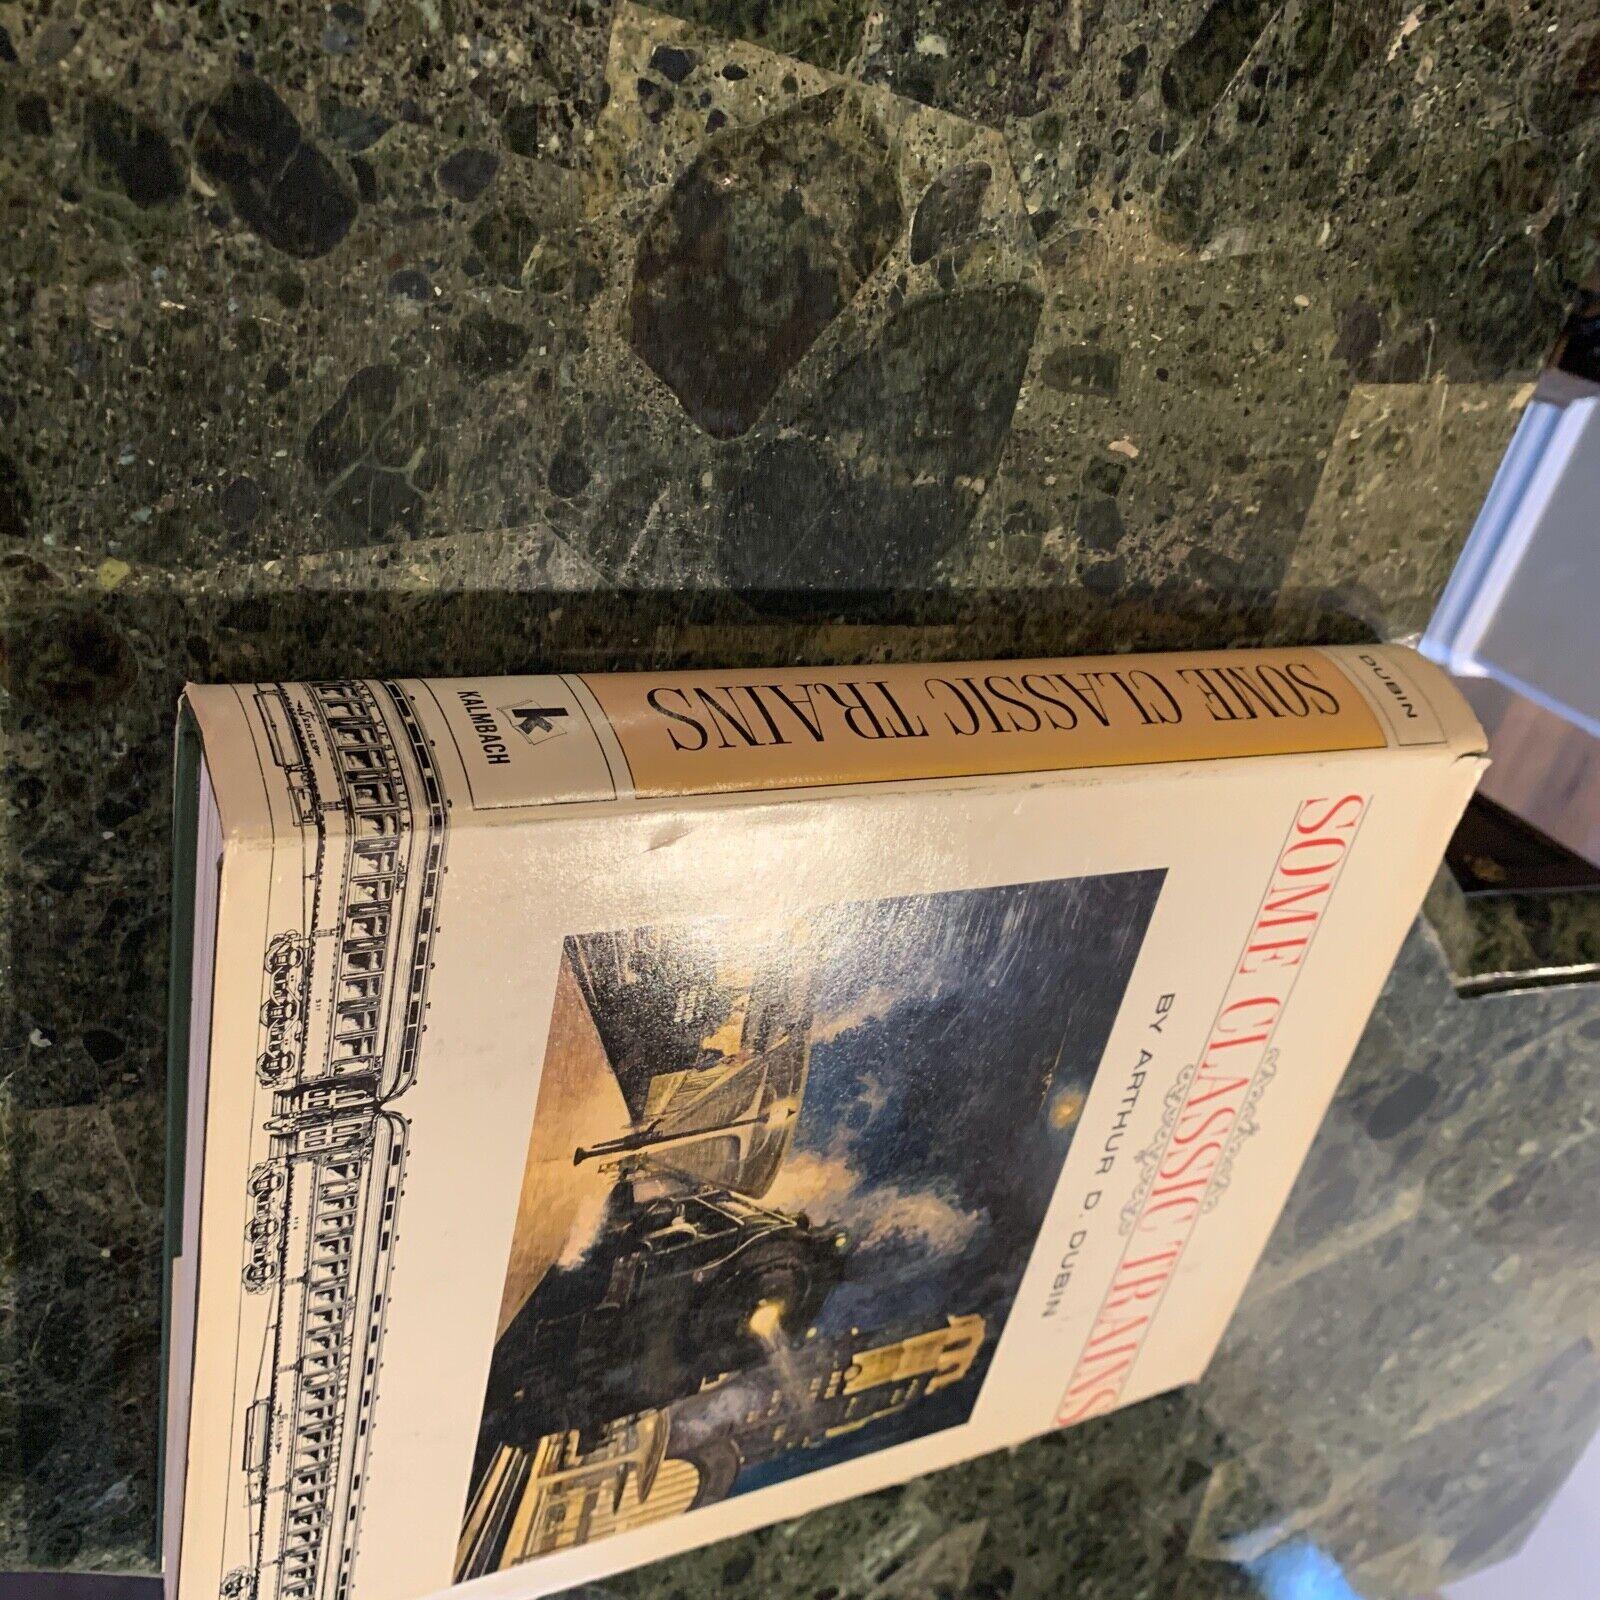 Some Classic Trains - Arthur D. Dubin Book